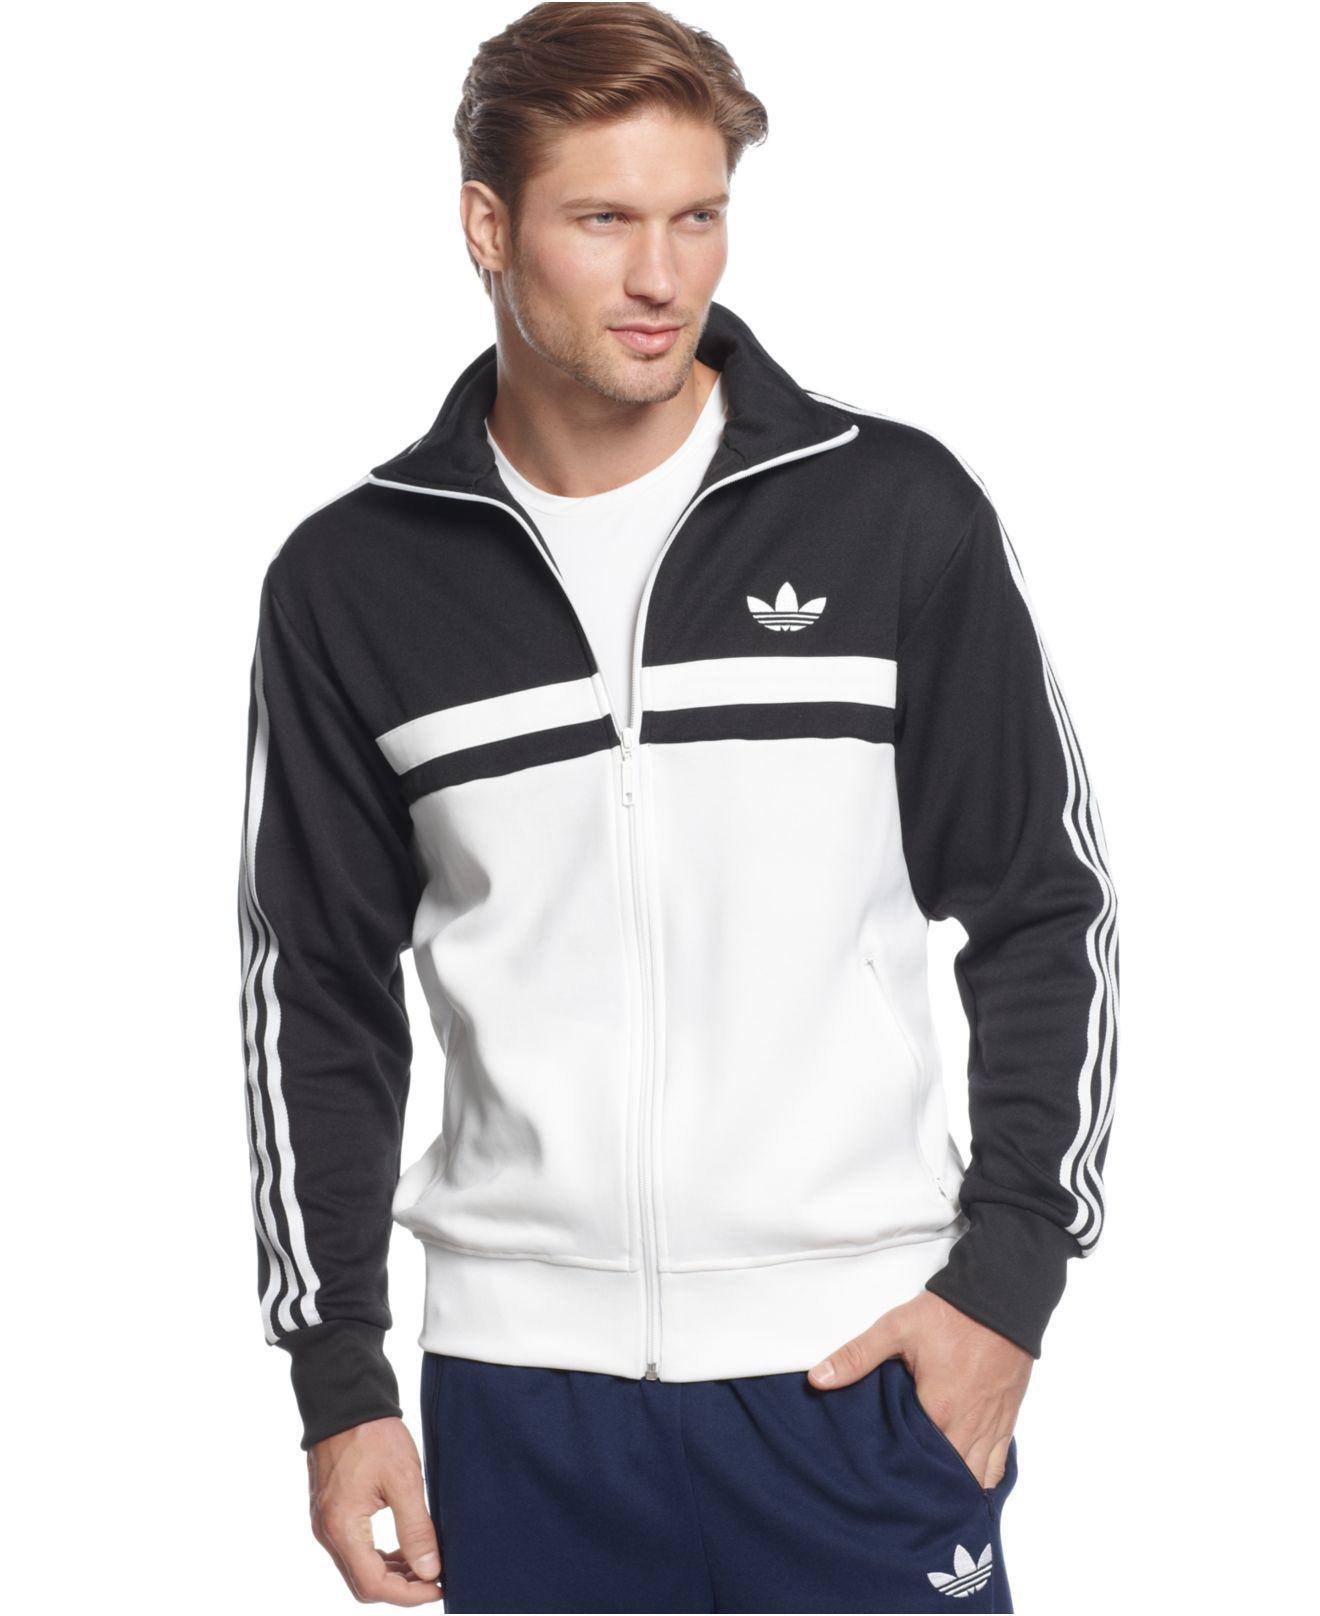 d4da60748b76 Lyst - adidas Originals Adi-Icon Track Jacket in Black for Men